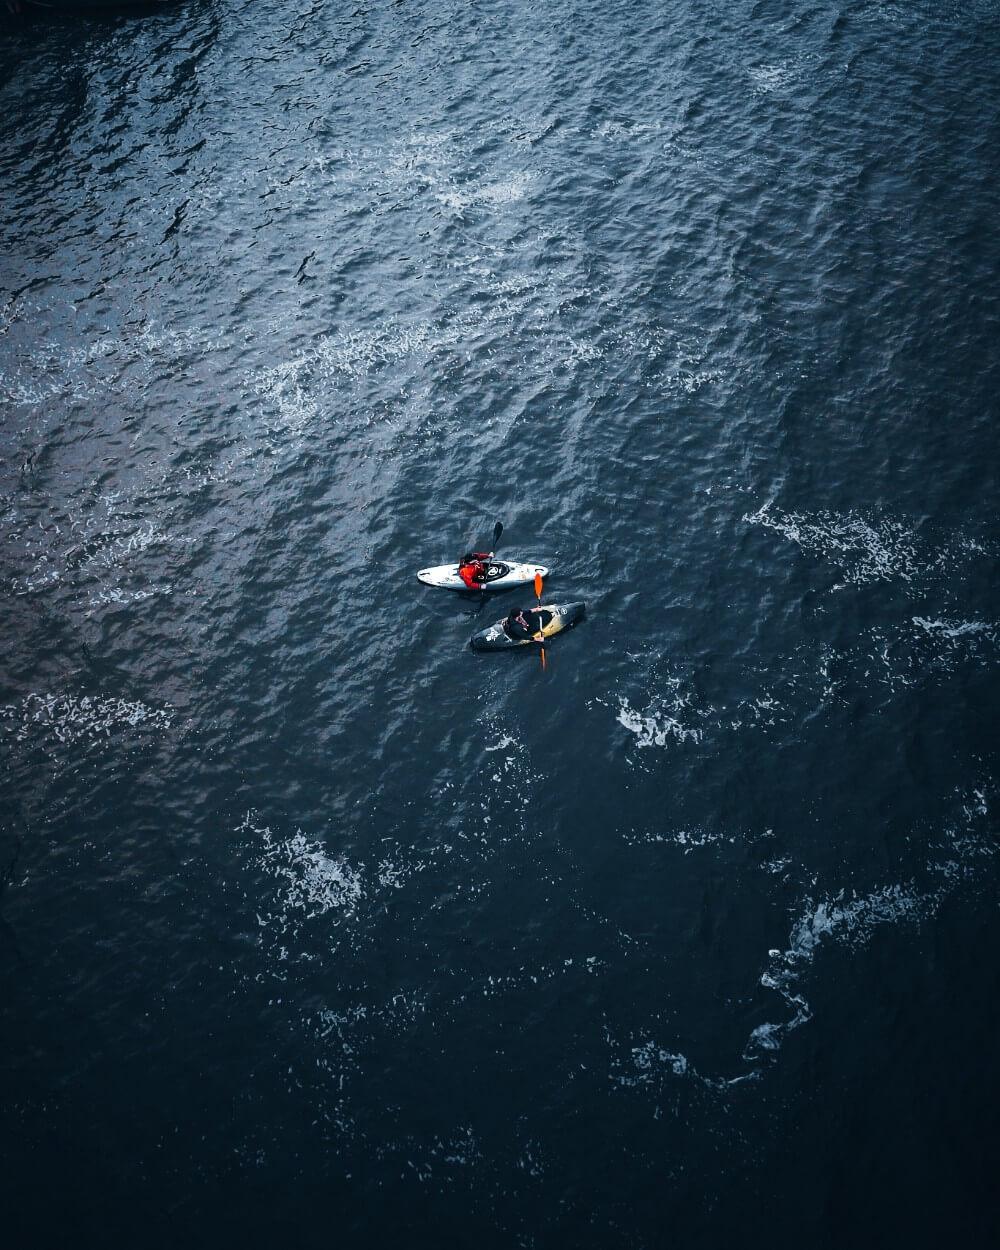 People kayaking in a lake in Belarus, drone view